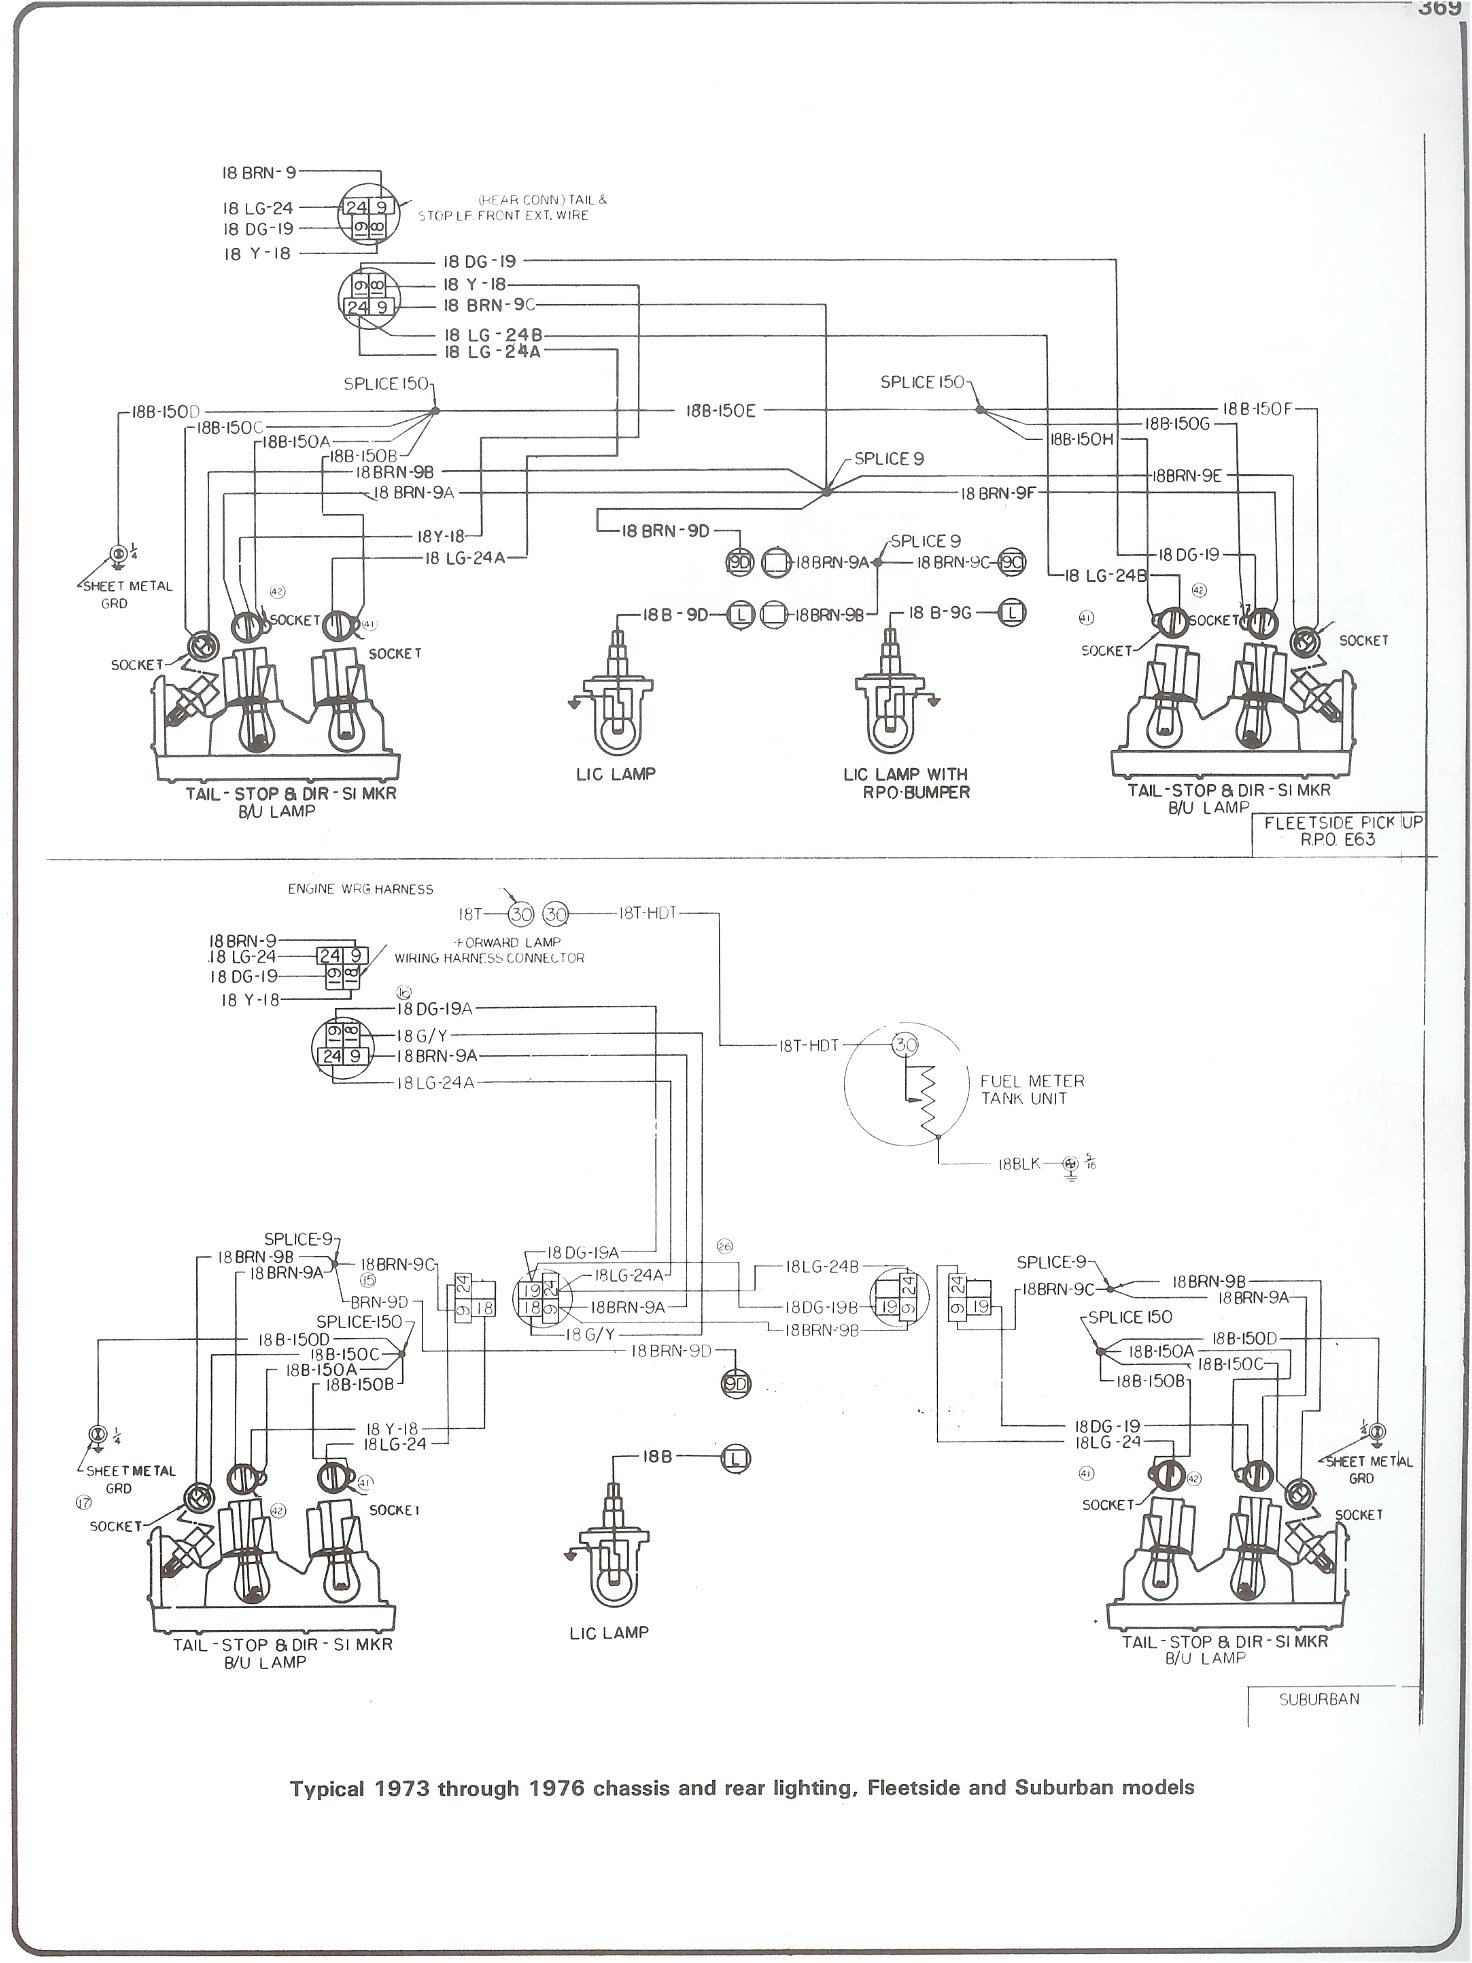 Complete 73-87 Wiring Diagrams - Starter Wiring Diagram